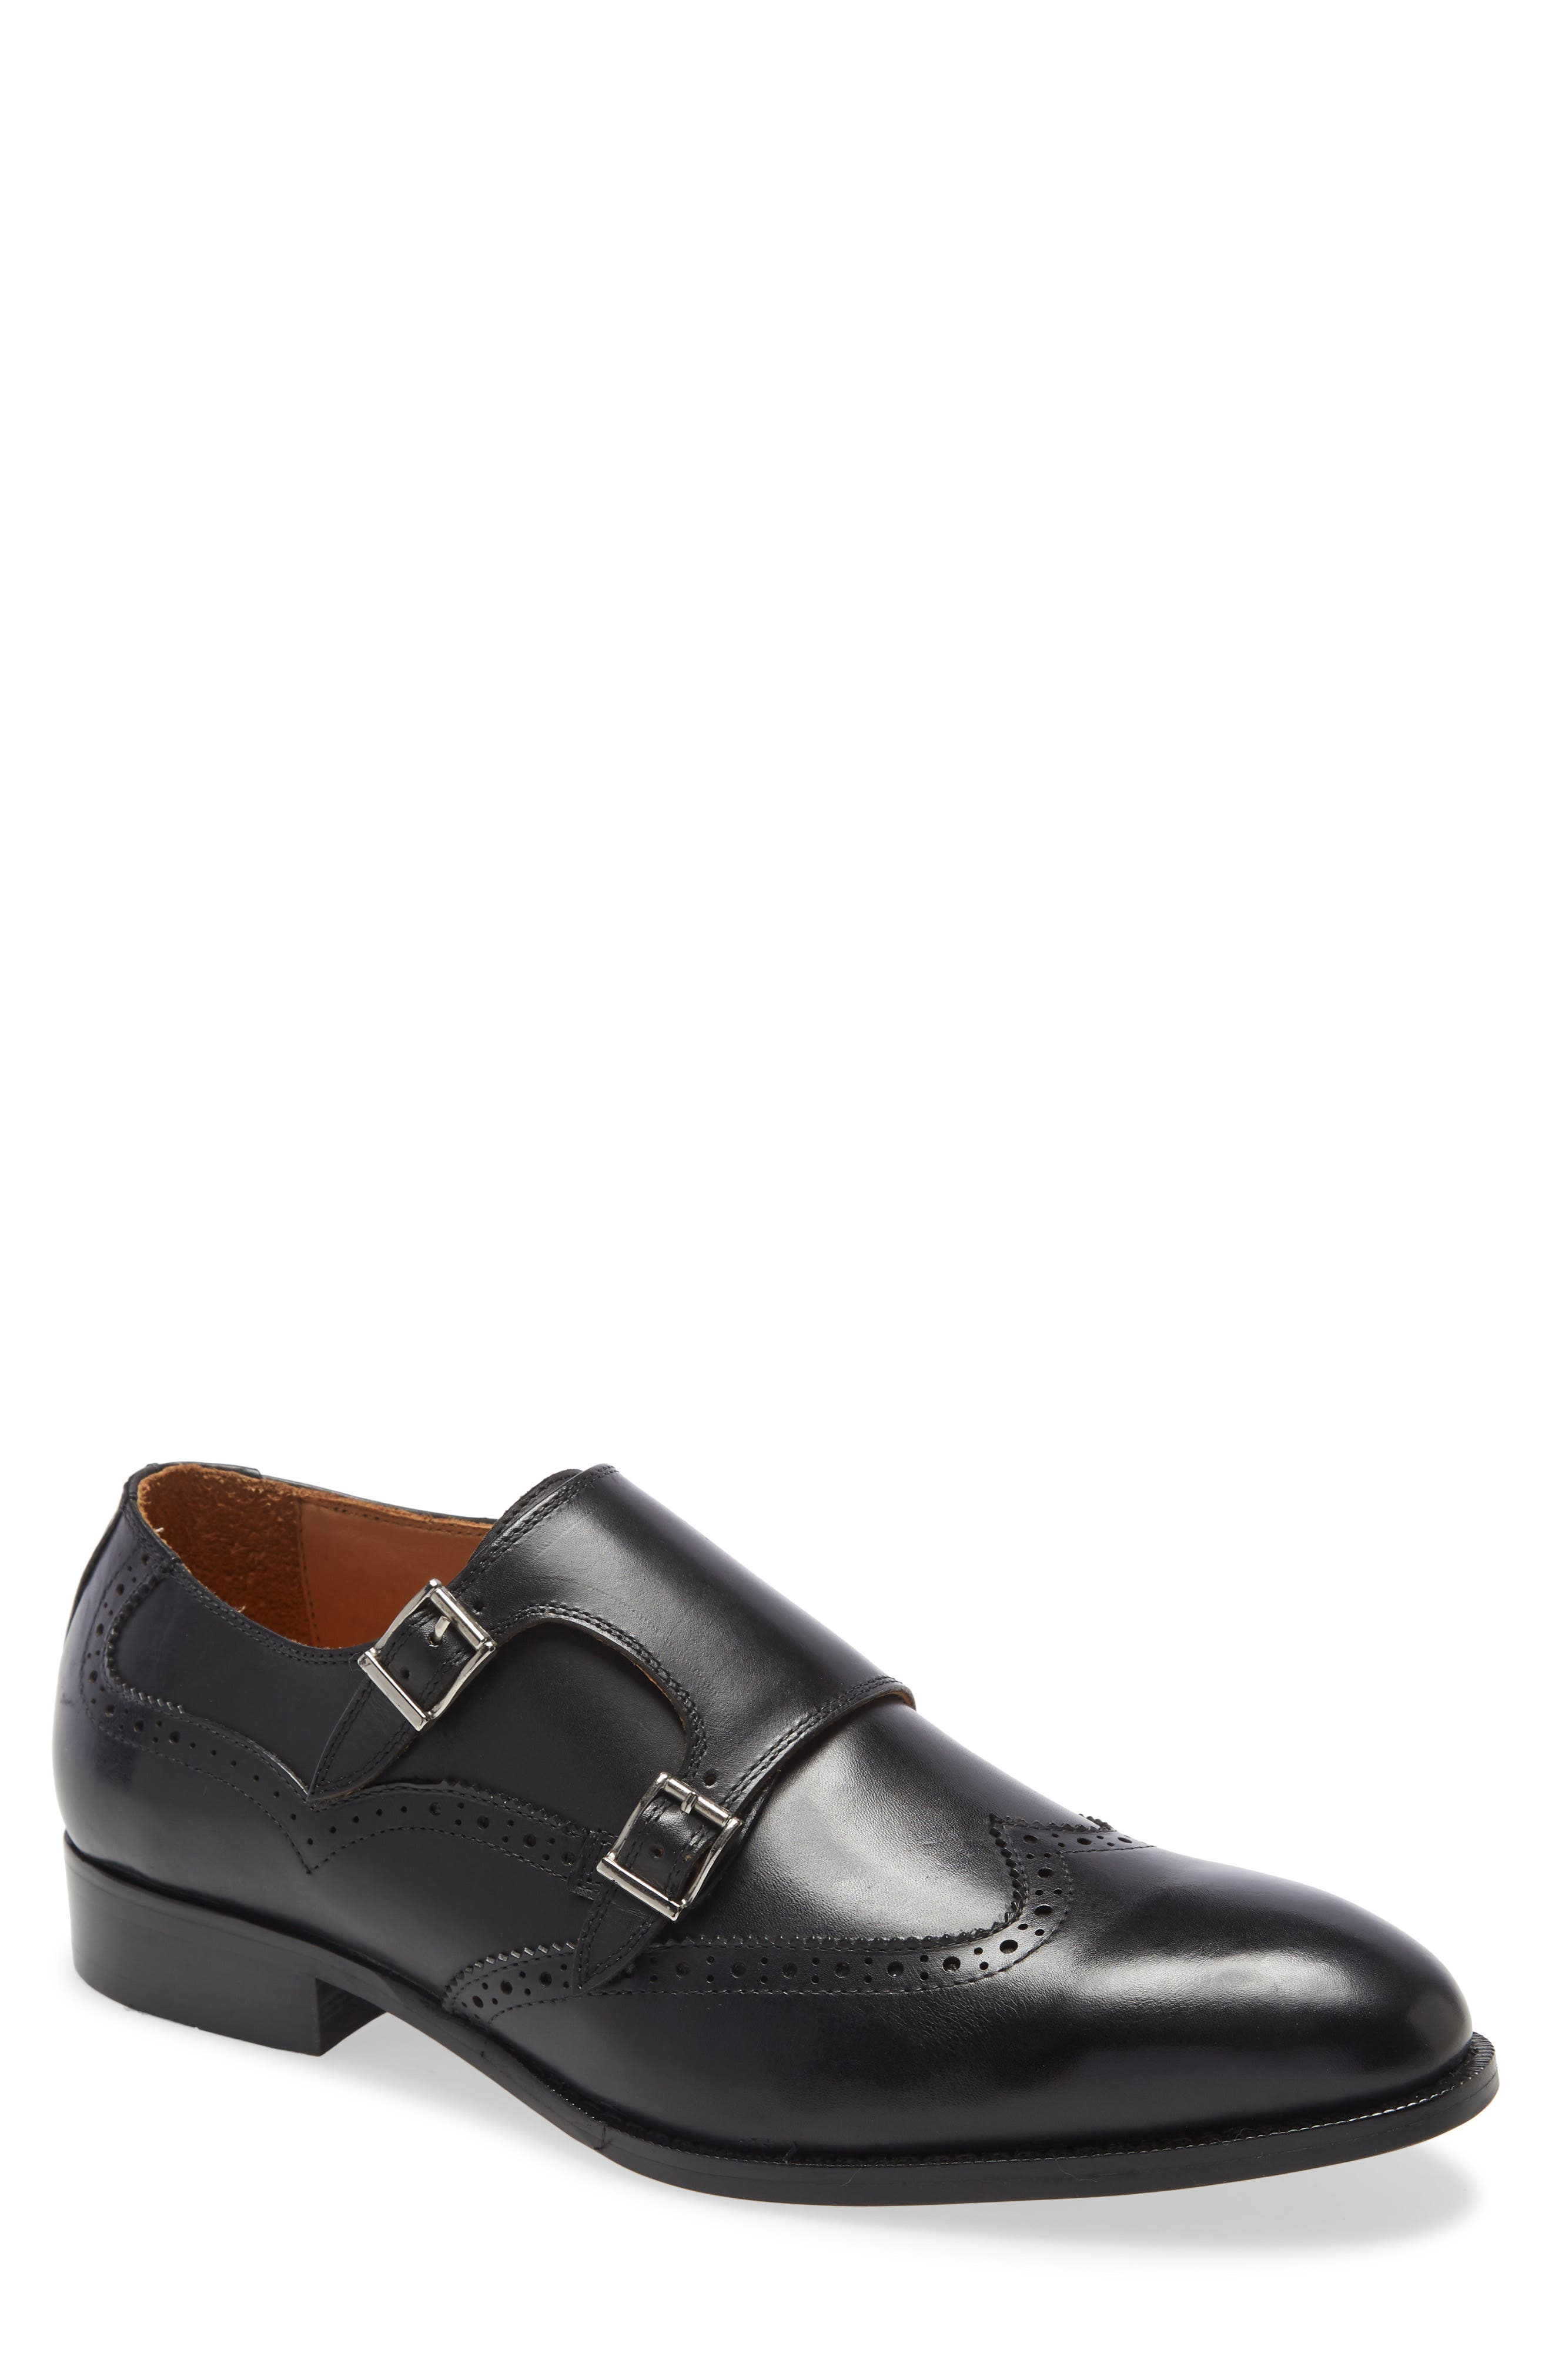 Easton Double Monk Strap Shoe